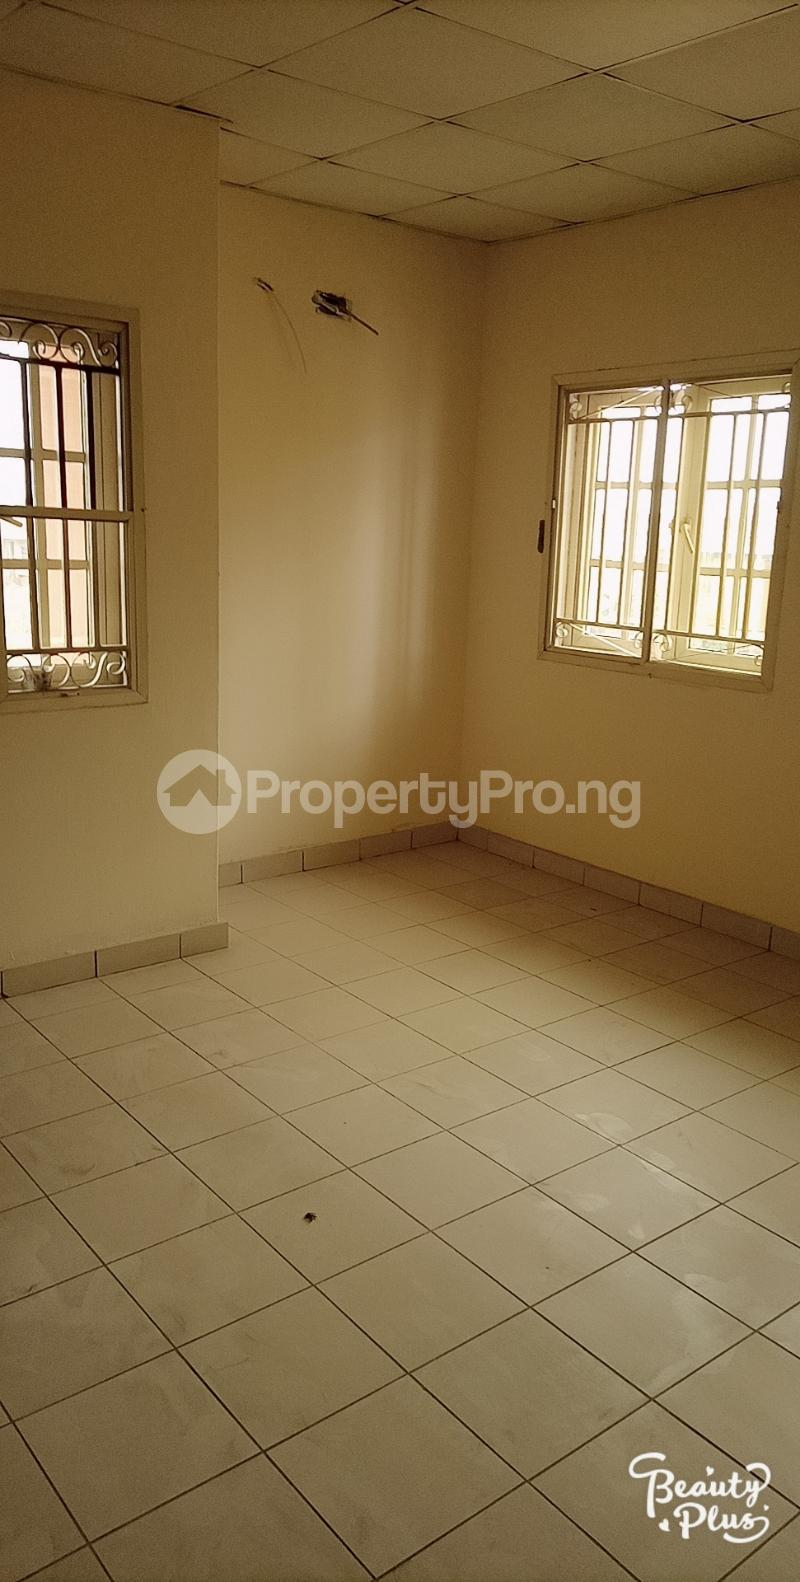 3 bedroom Flat / Apartment for rent Oke Afa isolo. Lagos Mainland Oke-Afa Isolo Lagos - 10